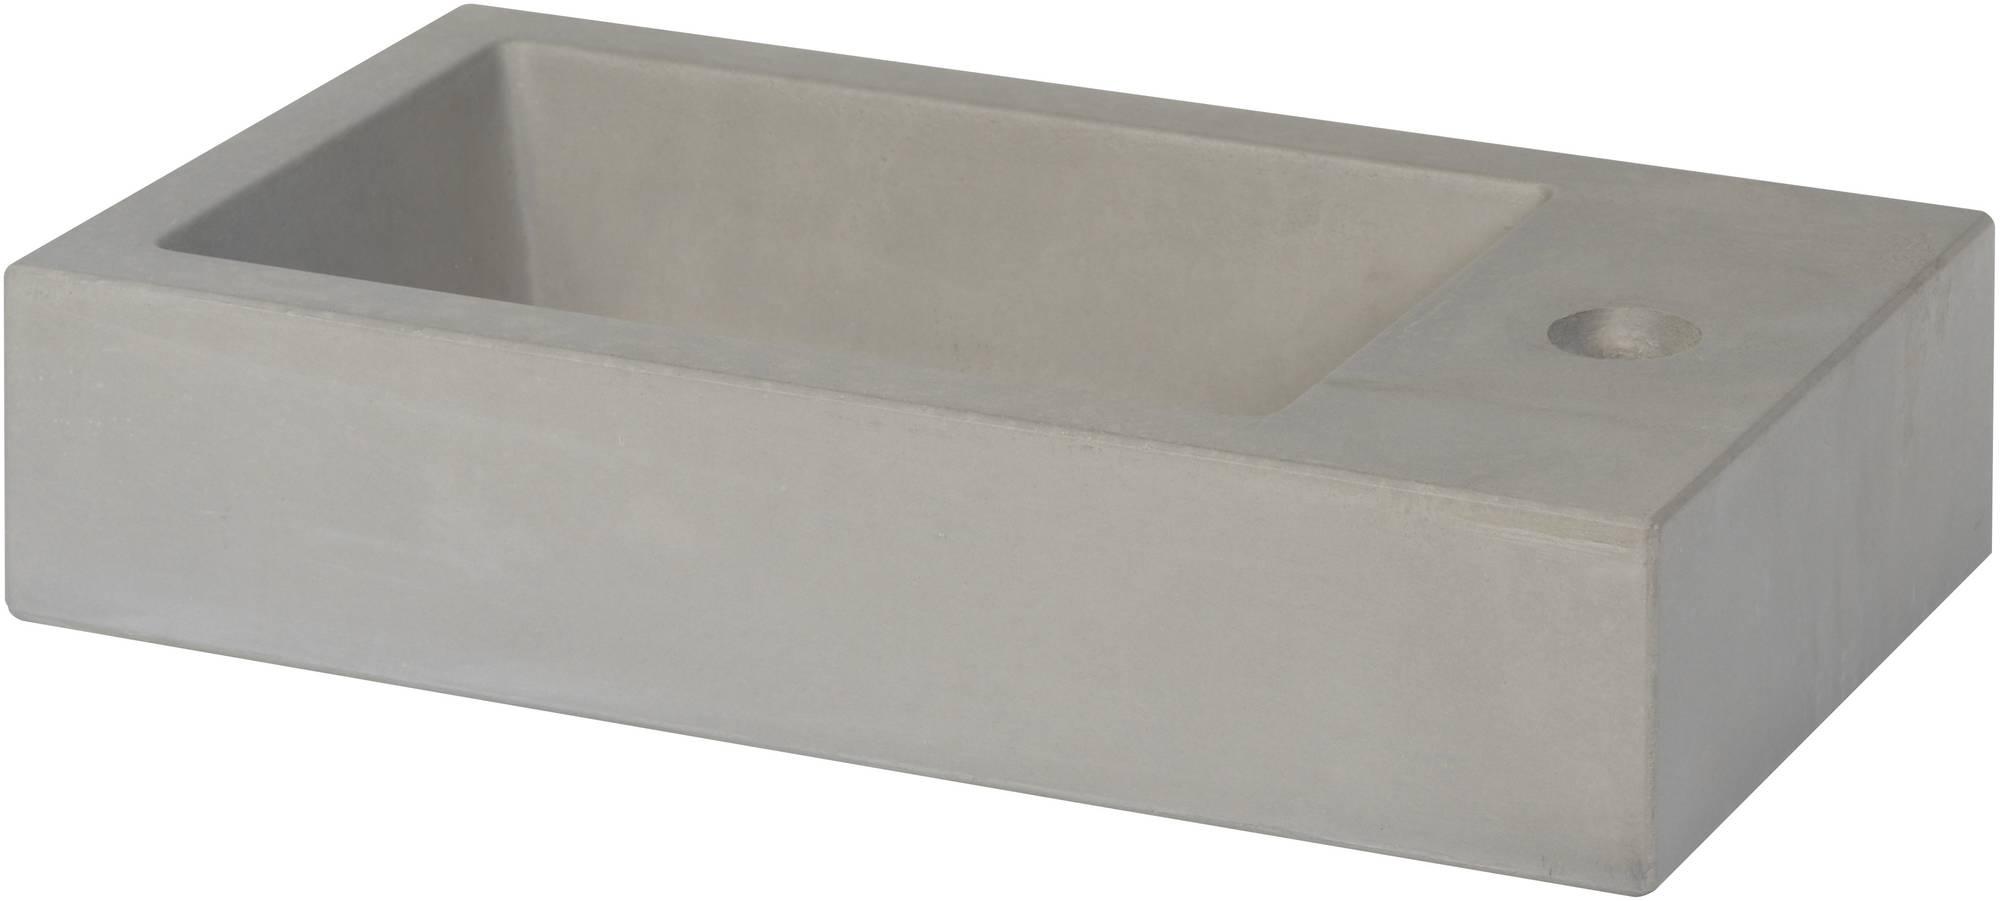 Ben Titan Fontein R 40x22,5x9,4 cm 1 Krg. Beton